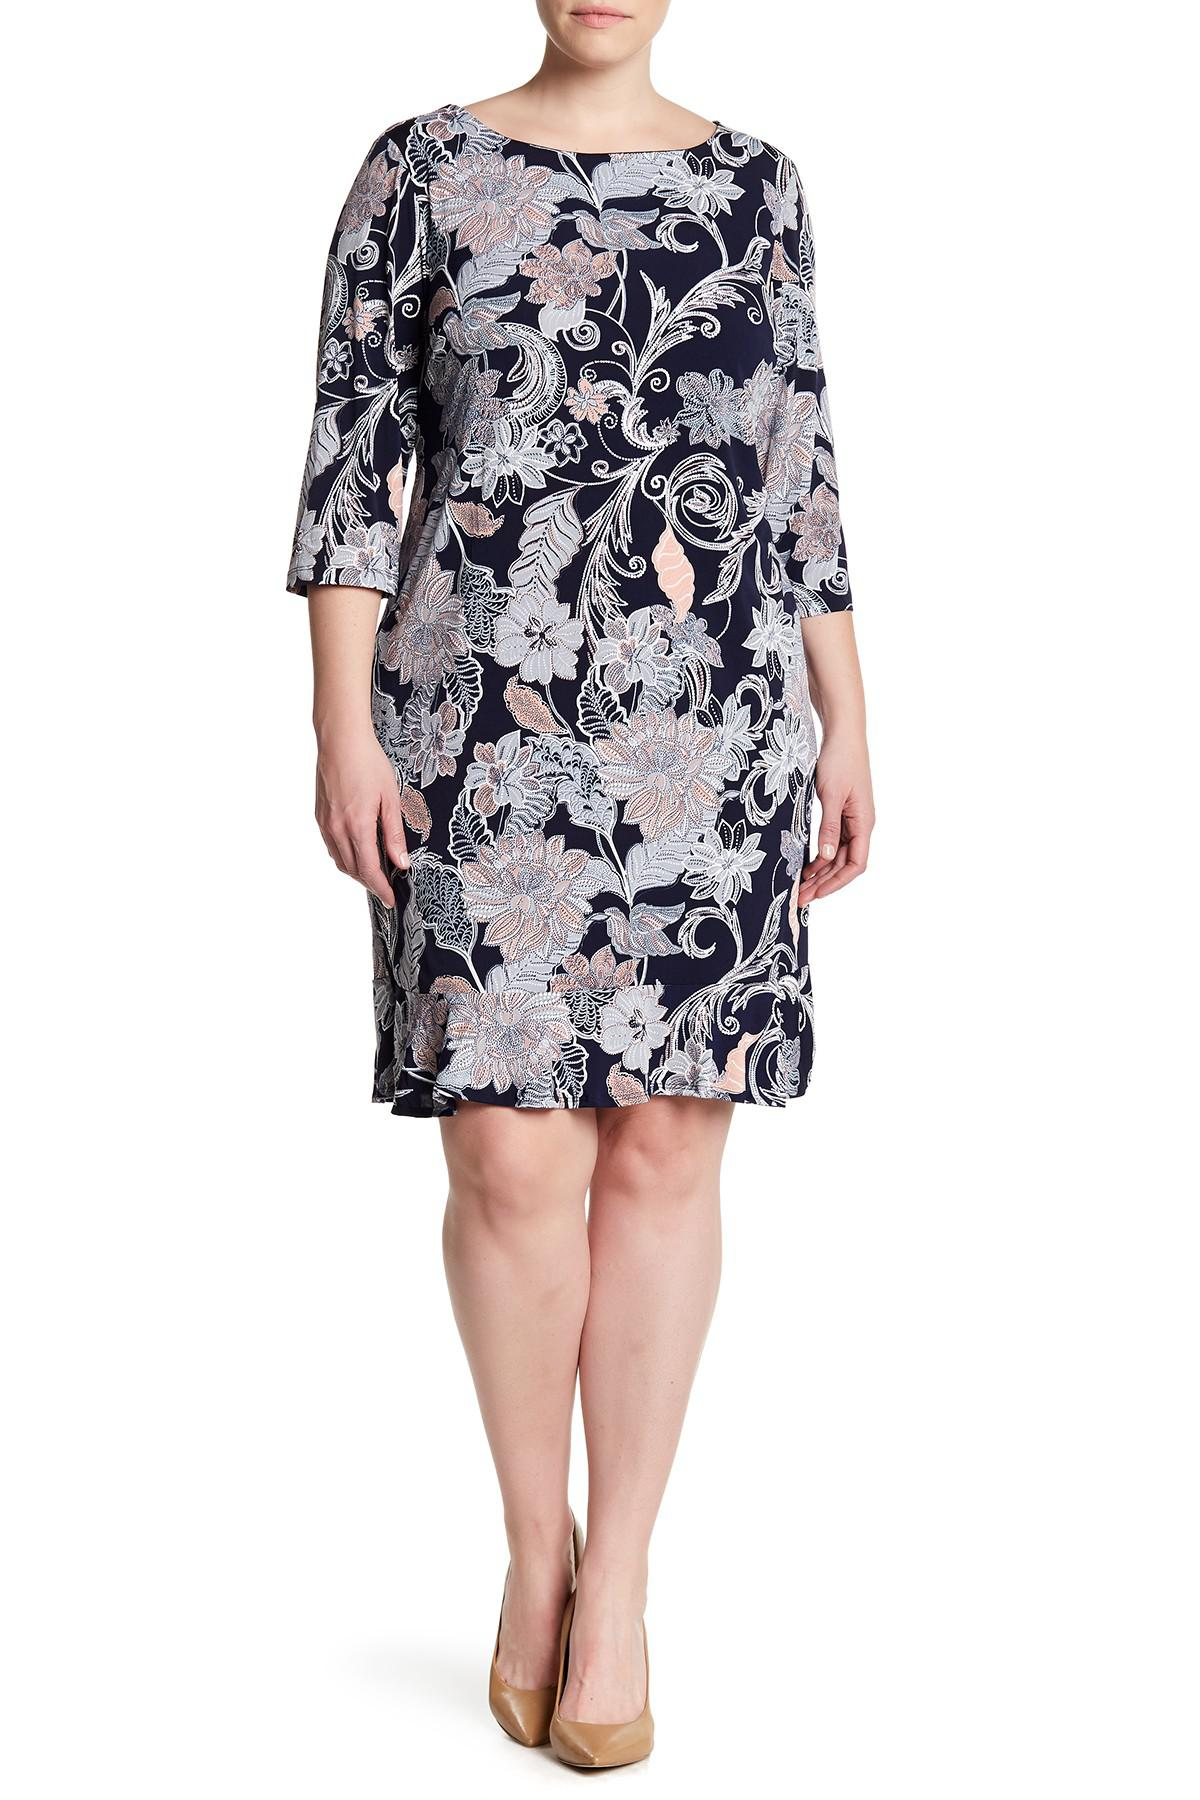 89cf4609147 Lyst - Sandra Darren Textured Floral Dress (plus Size)